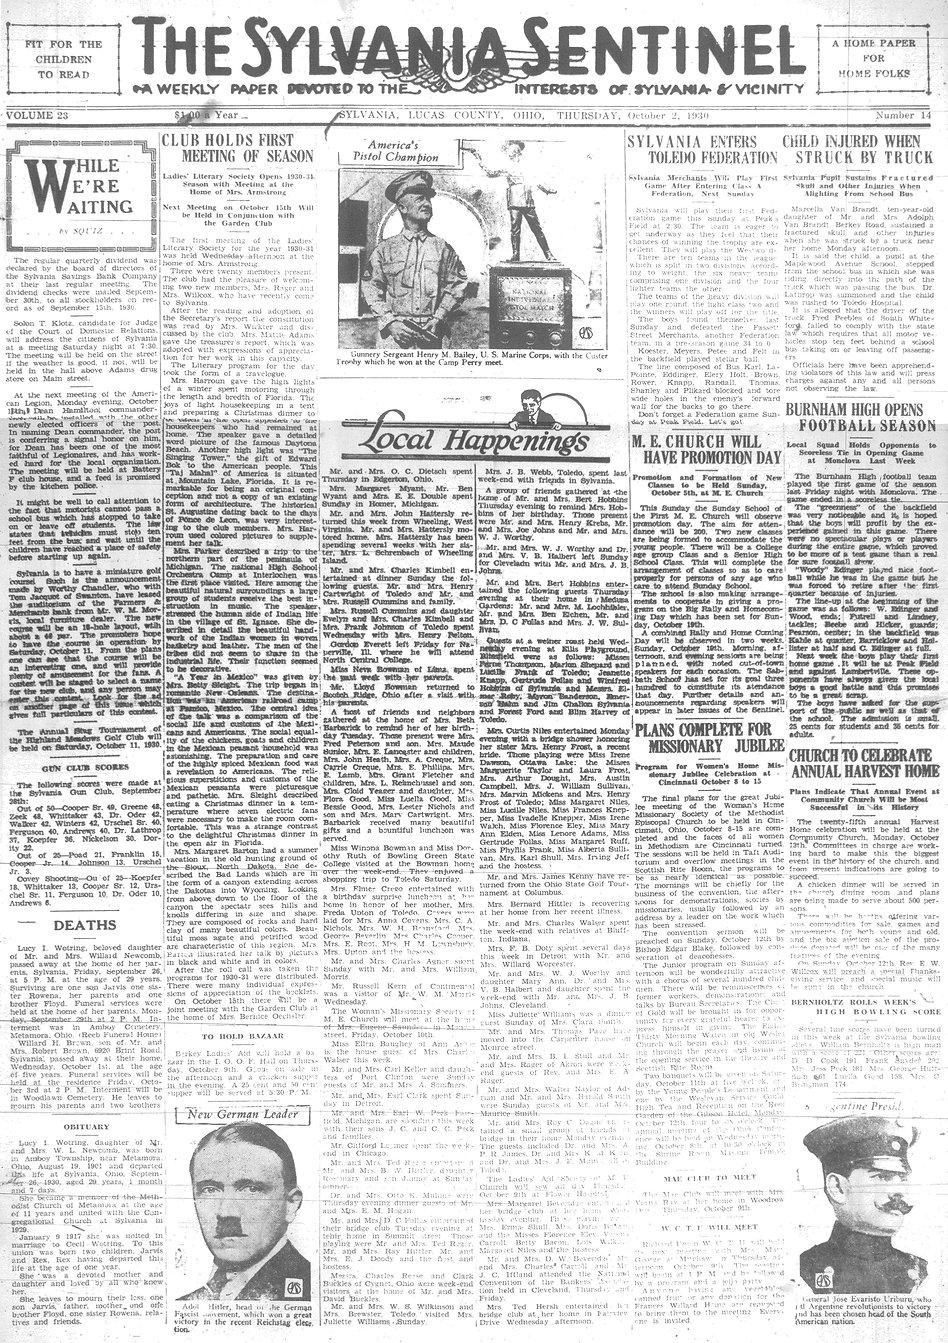 1930 oct 2 sylvania Sentinel